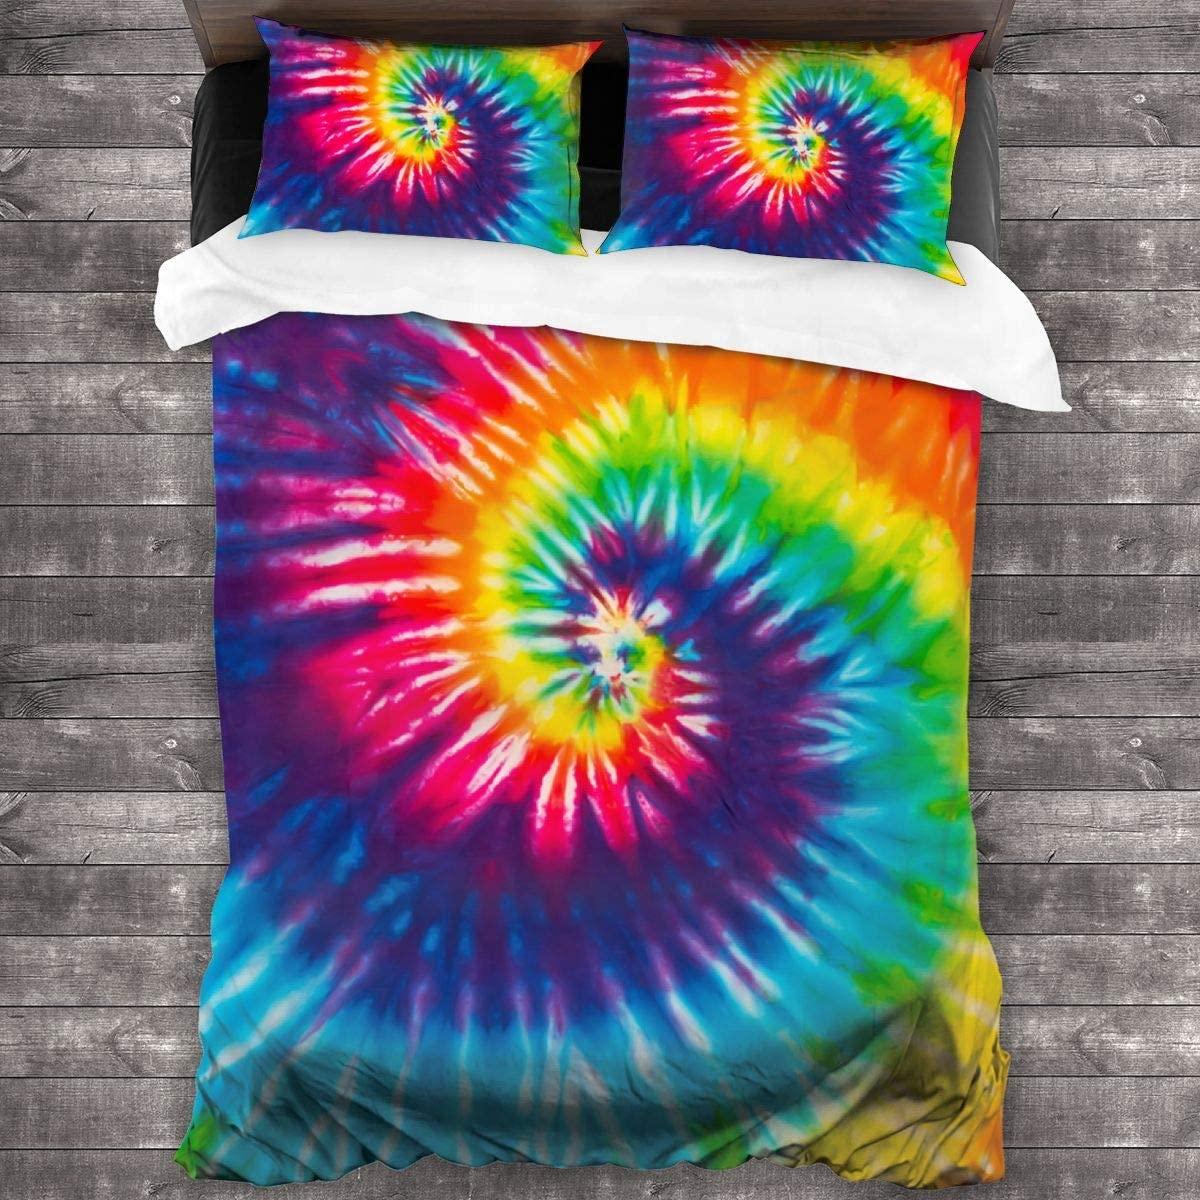 BLUBLU Super Soft Duvet Cover Set Microfiber Comforter Bed Set with Zipper Closure, Machine Washable(Includes 1 Duvet Cover, 2 Pillowcases) - Tie Dye Colorful Rainbow